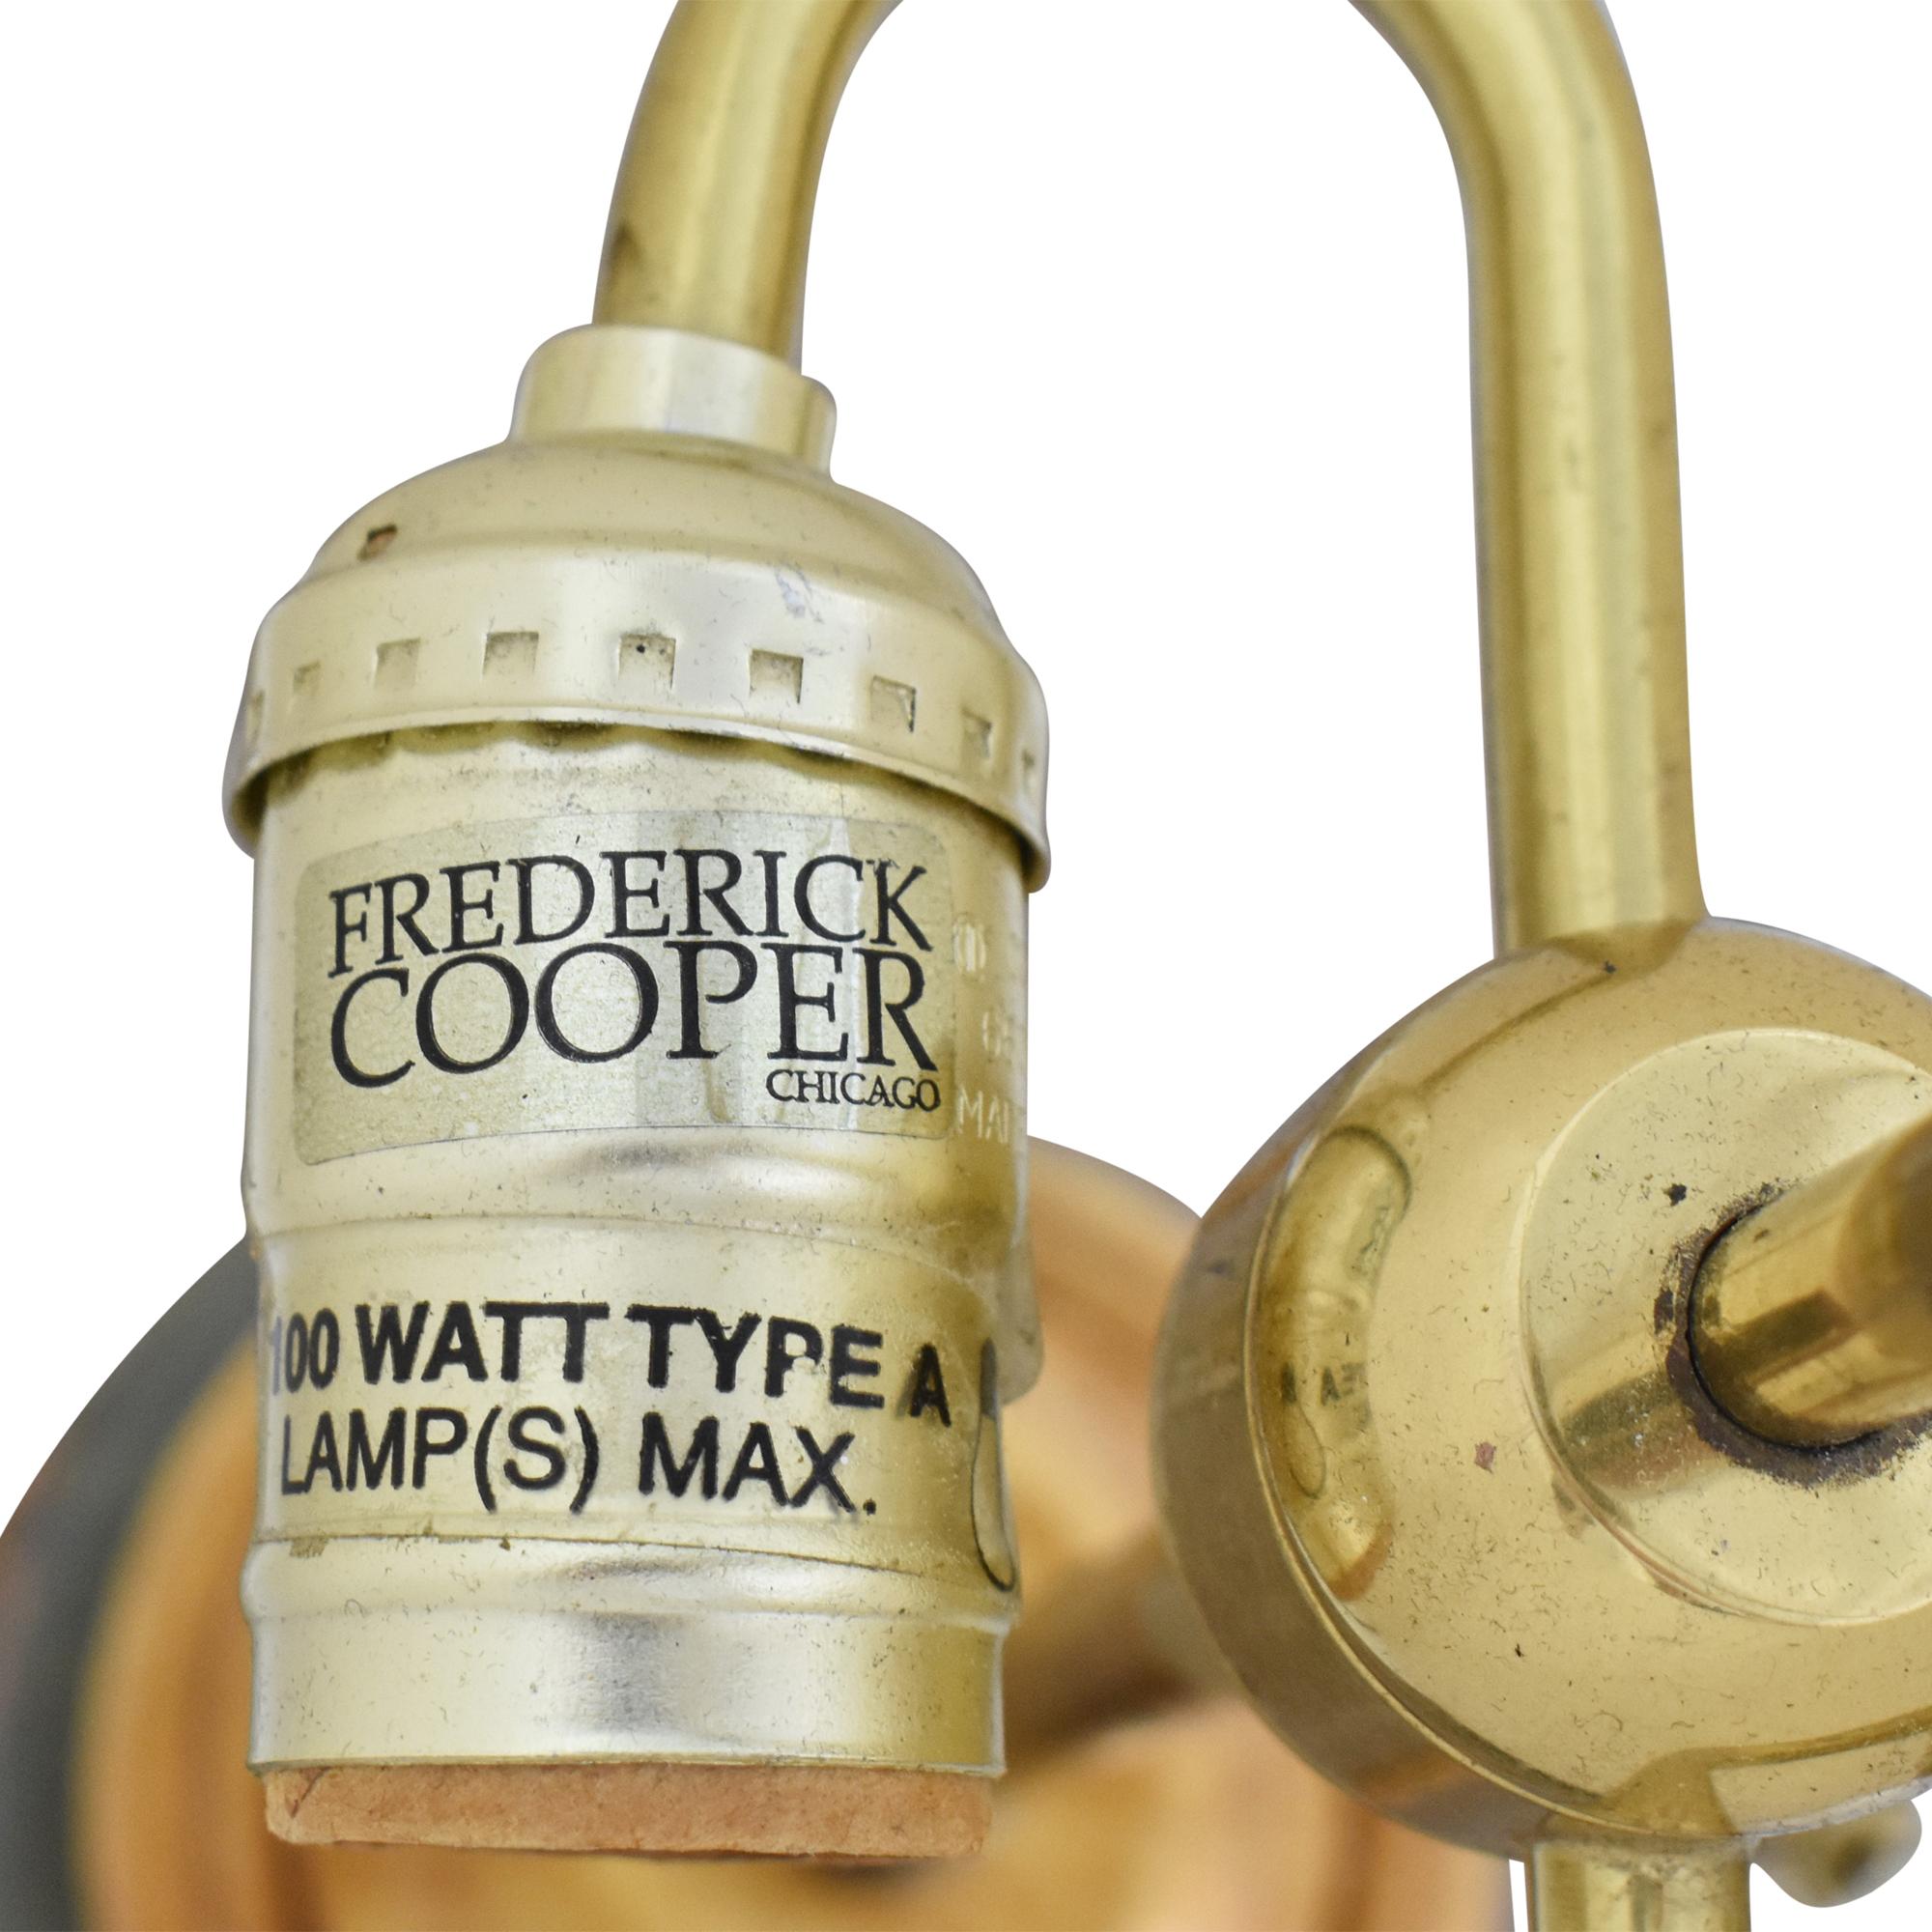 Frederick Cooper Frederick Cooper Urn Lamp second hand